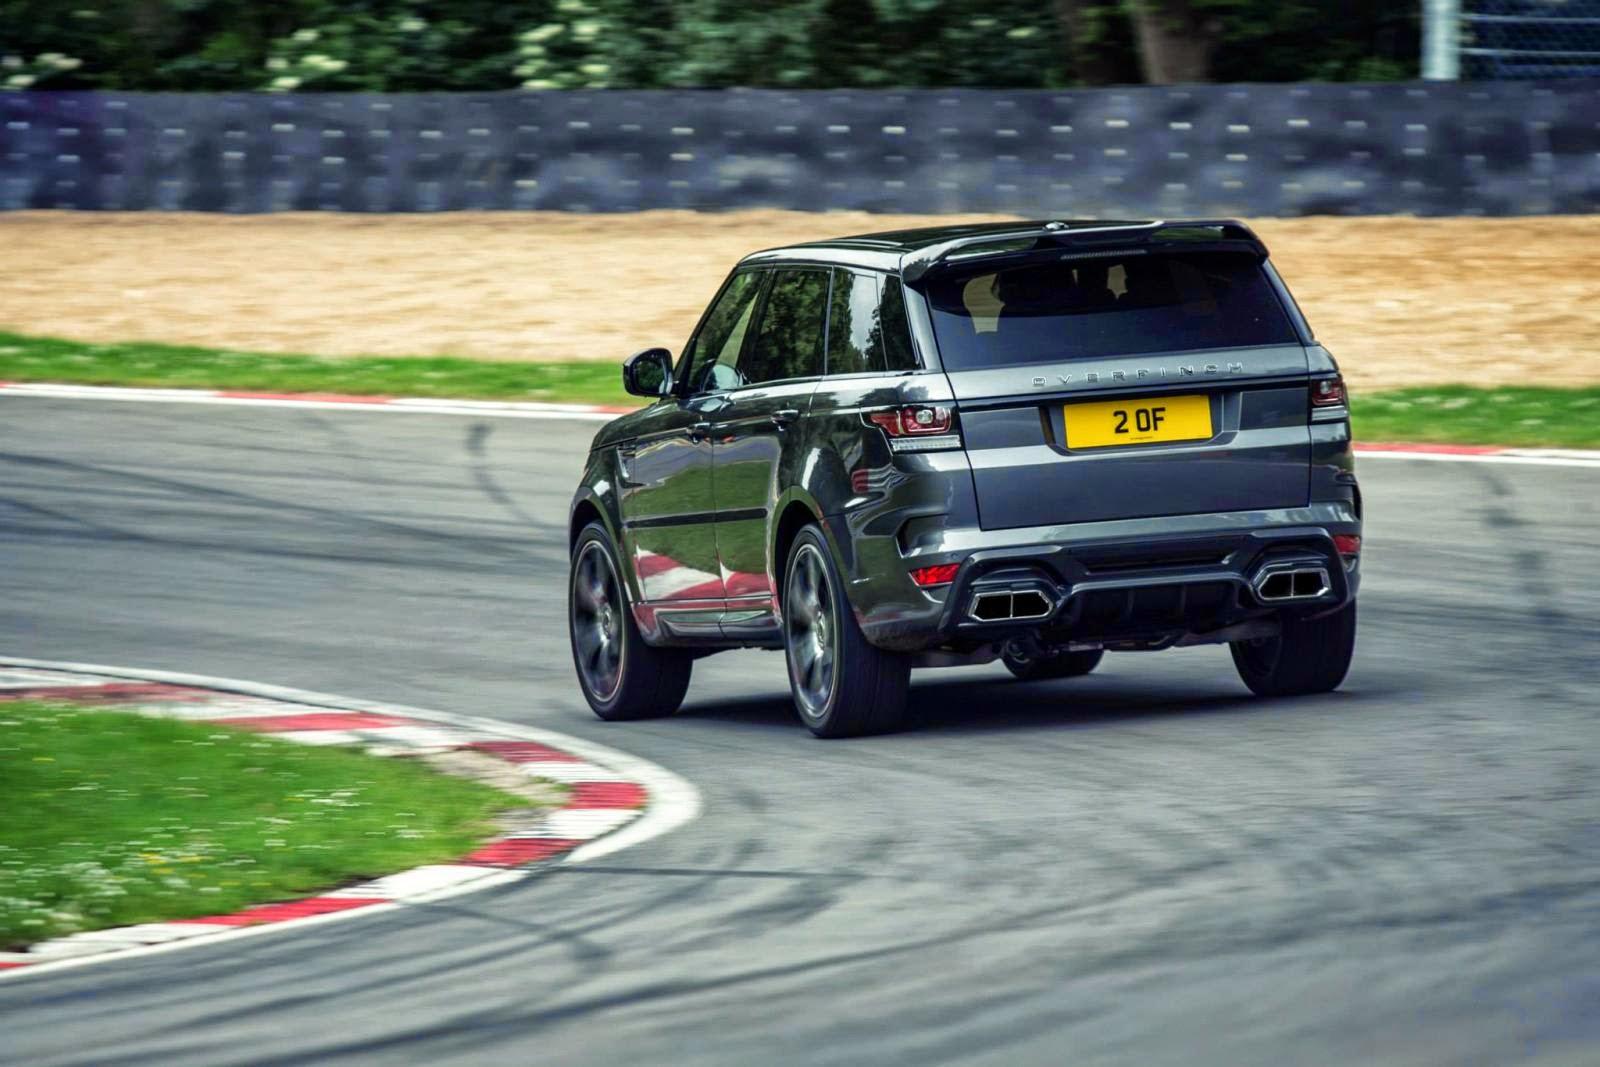 [Resim: Overfinch+Range+Rover+Sport+2.jpg]